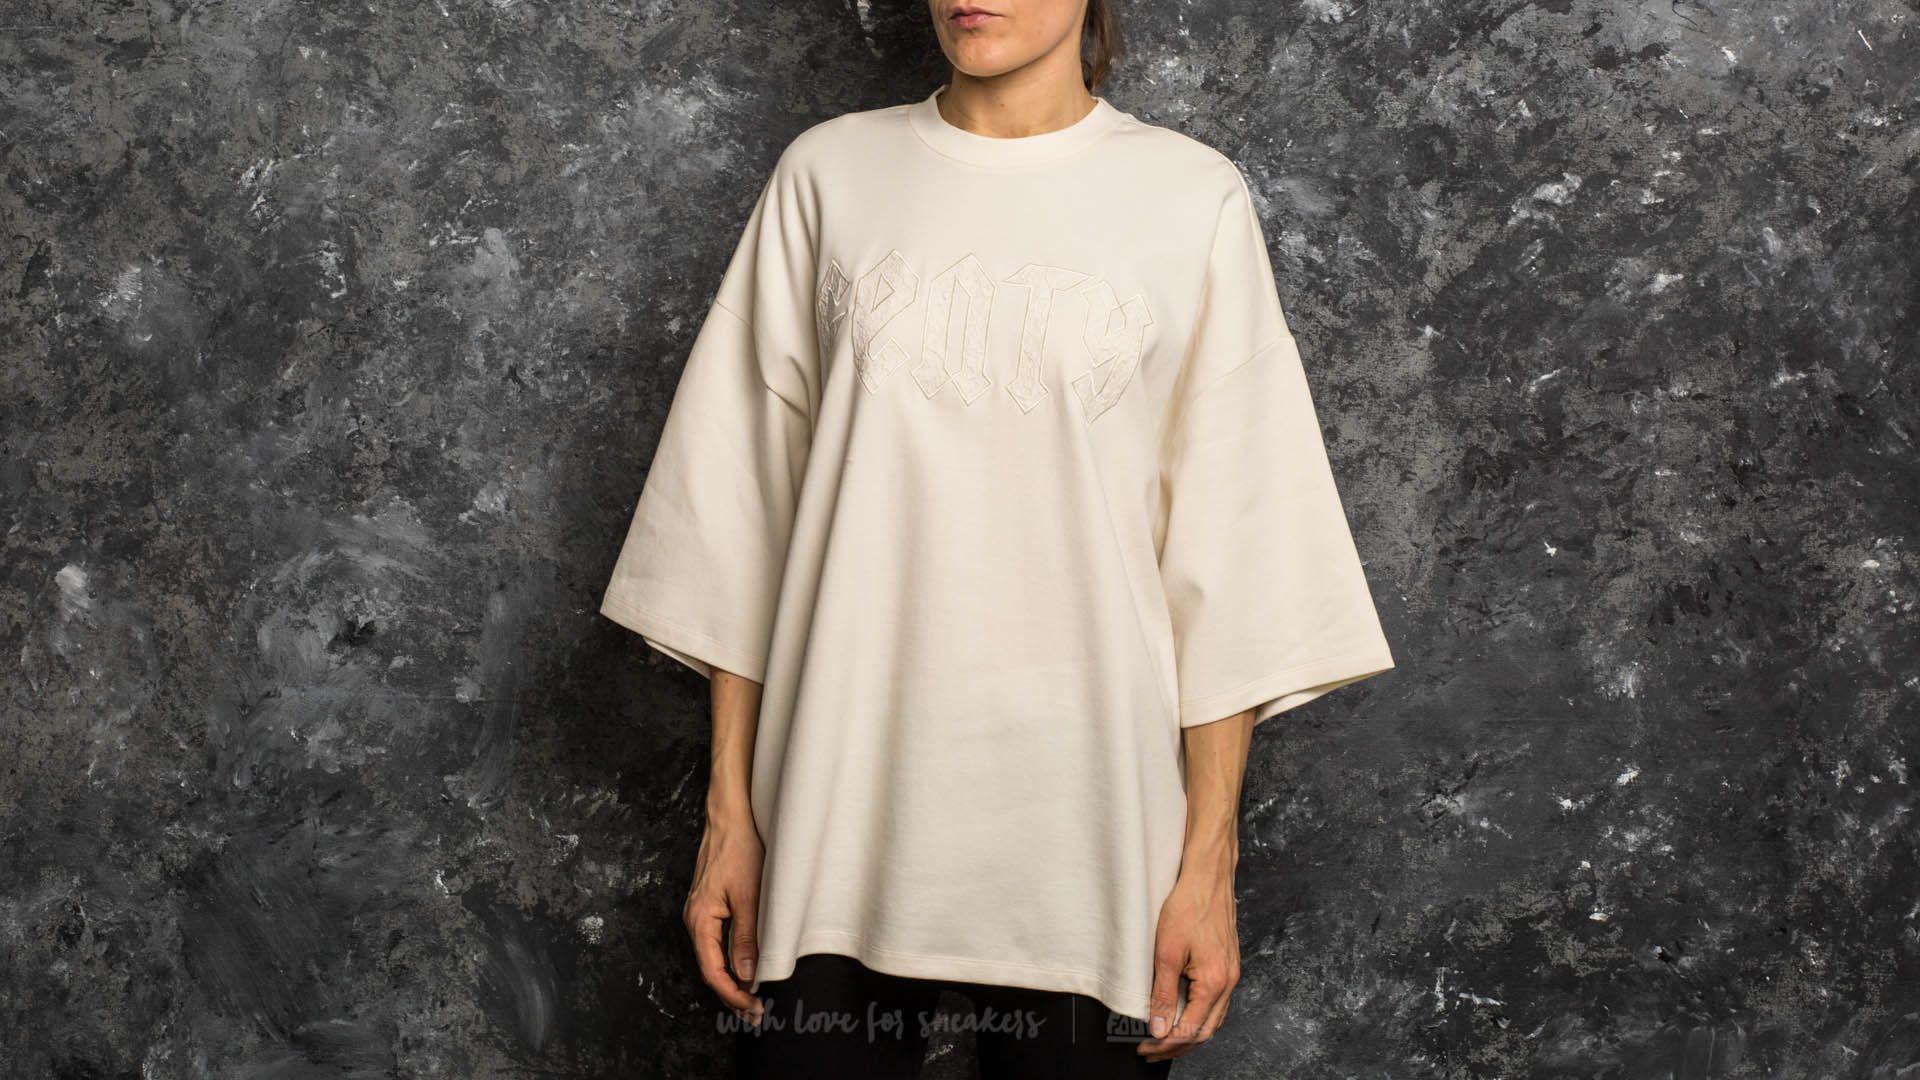 sale retailer 23b65 ae36f Puma Fenty x Rihanna Oversized Crewneck T-Shirt Vanilla Ice ...